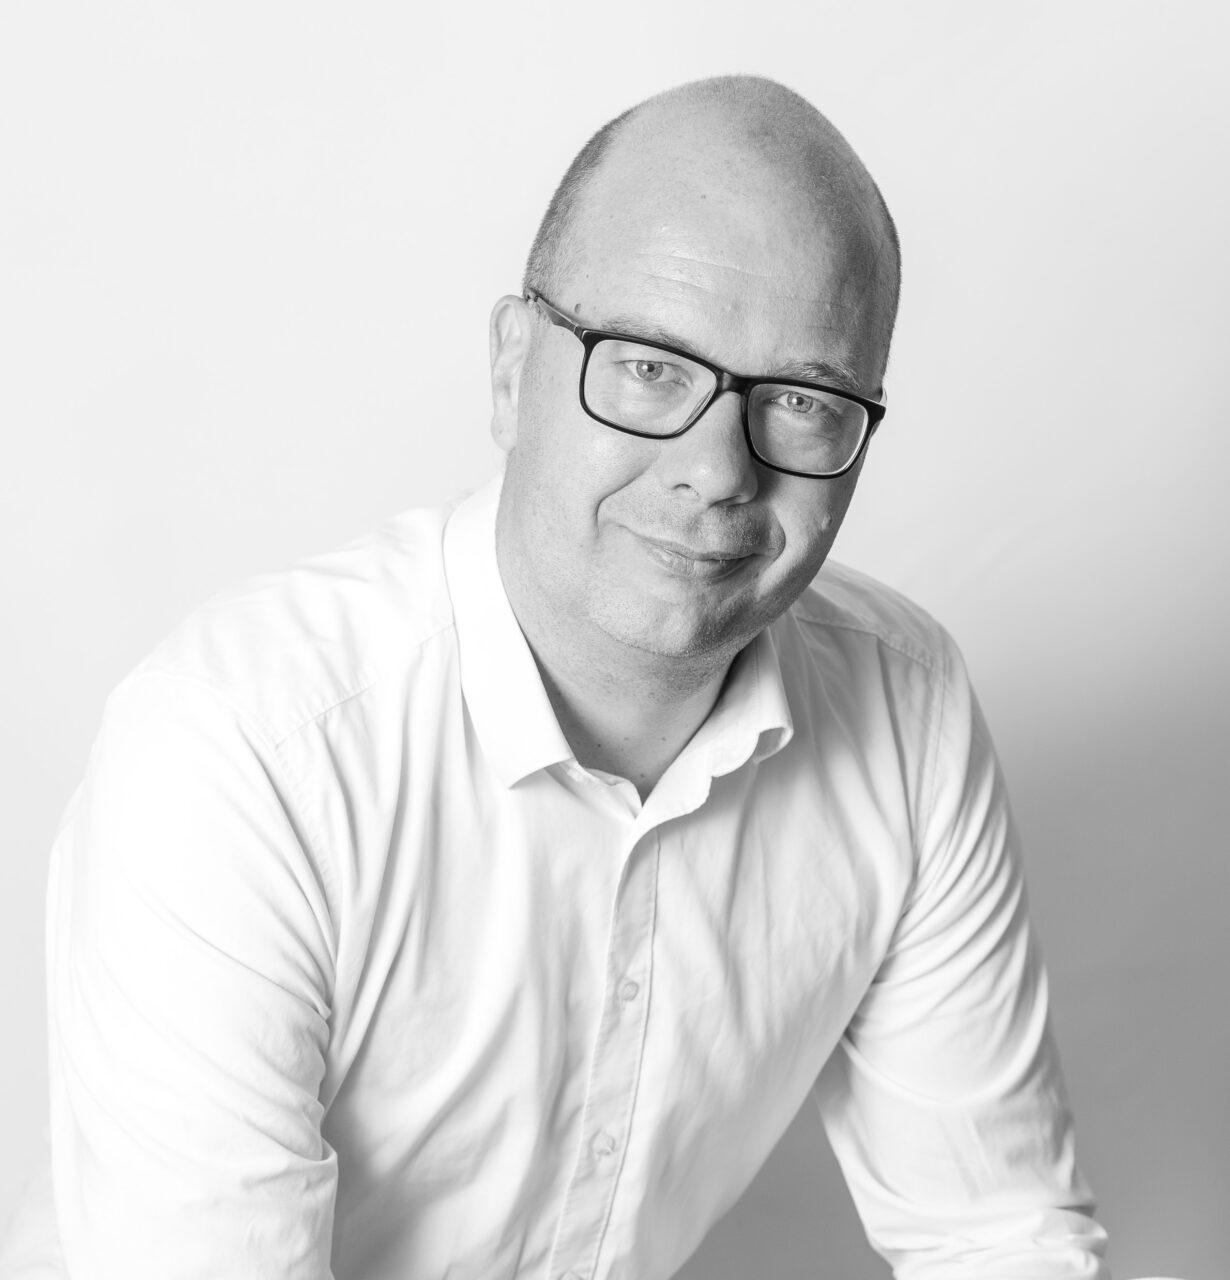 Richard Veurink